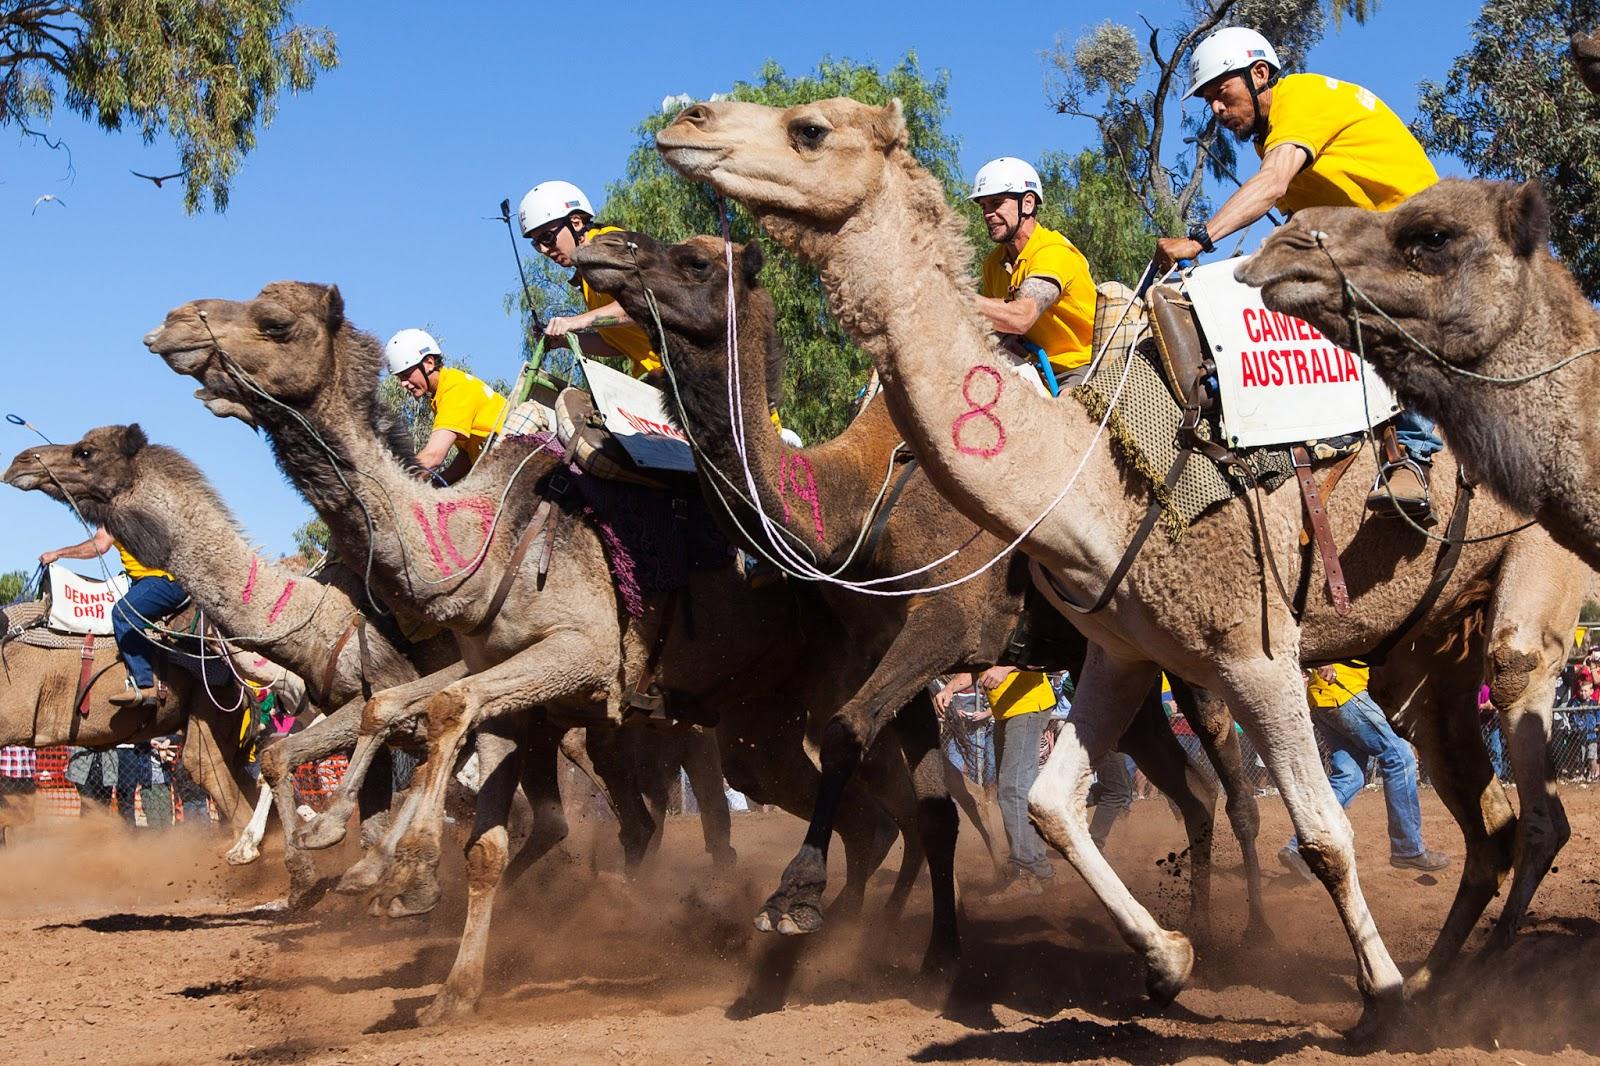 Downunder Daisy: Australian Camels